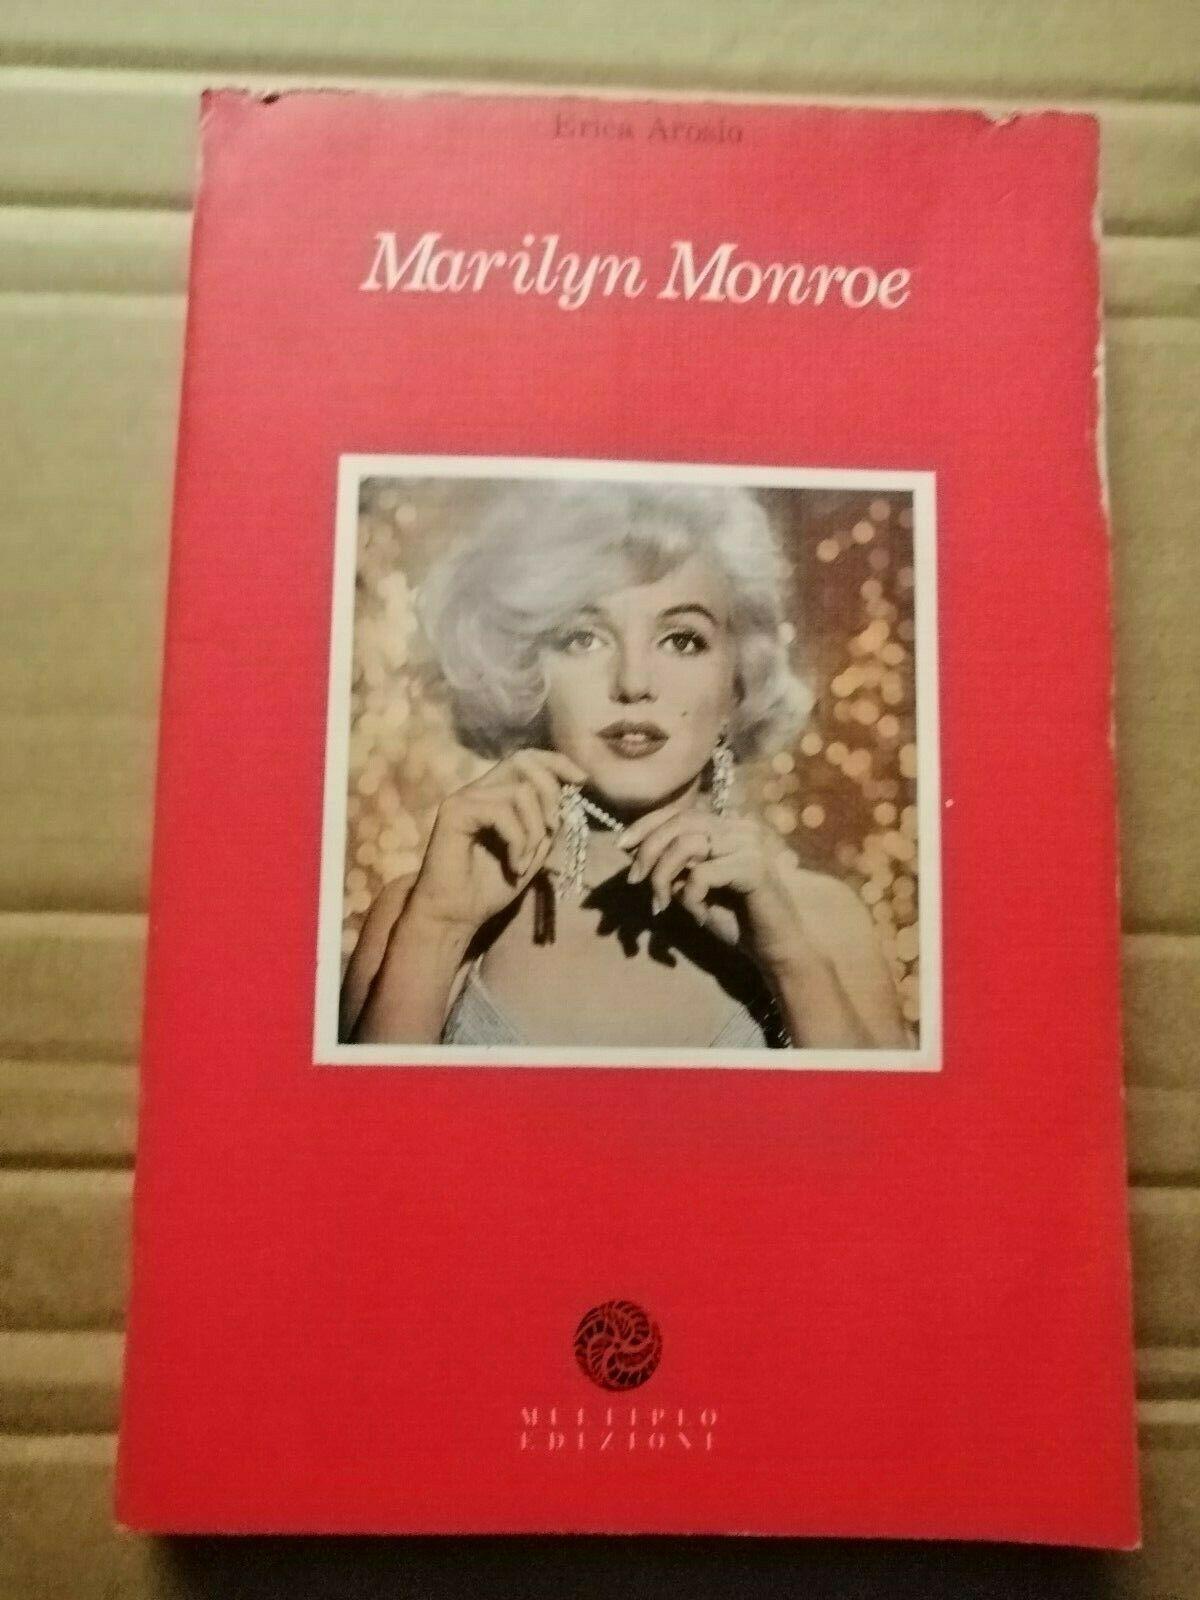 ERICA AROSIO – Marilyn Monroe 1° EDIZIONE 1989  raro – 11 €